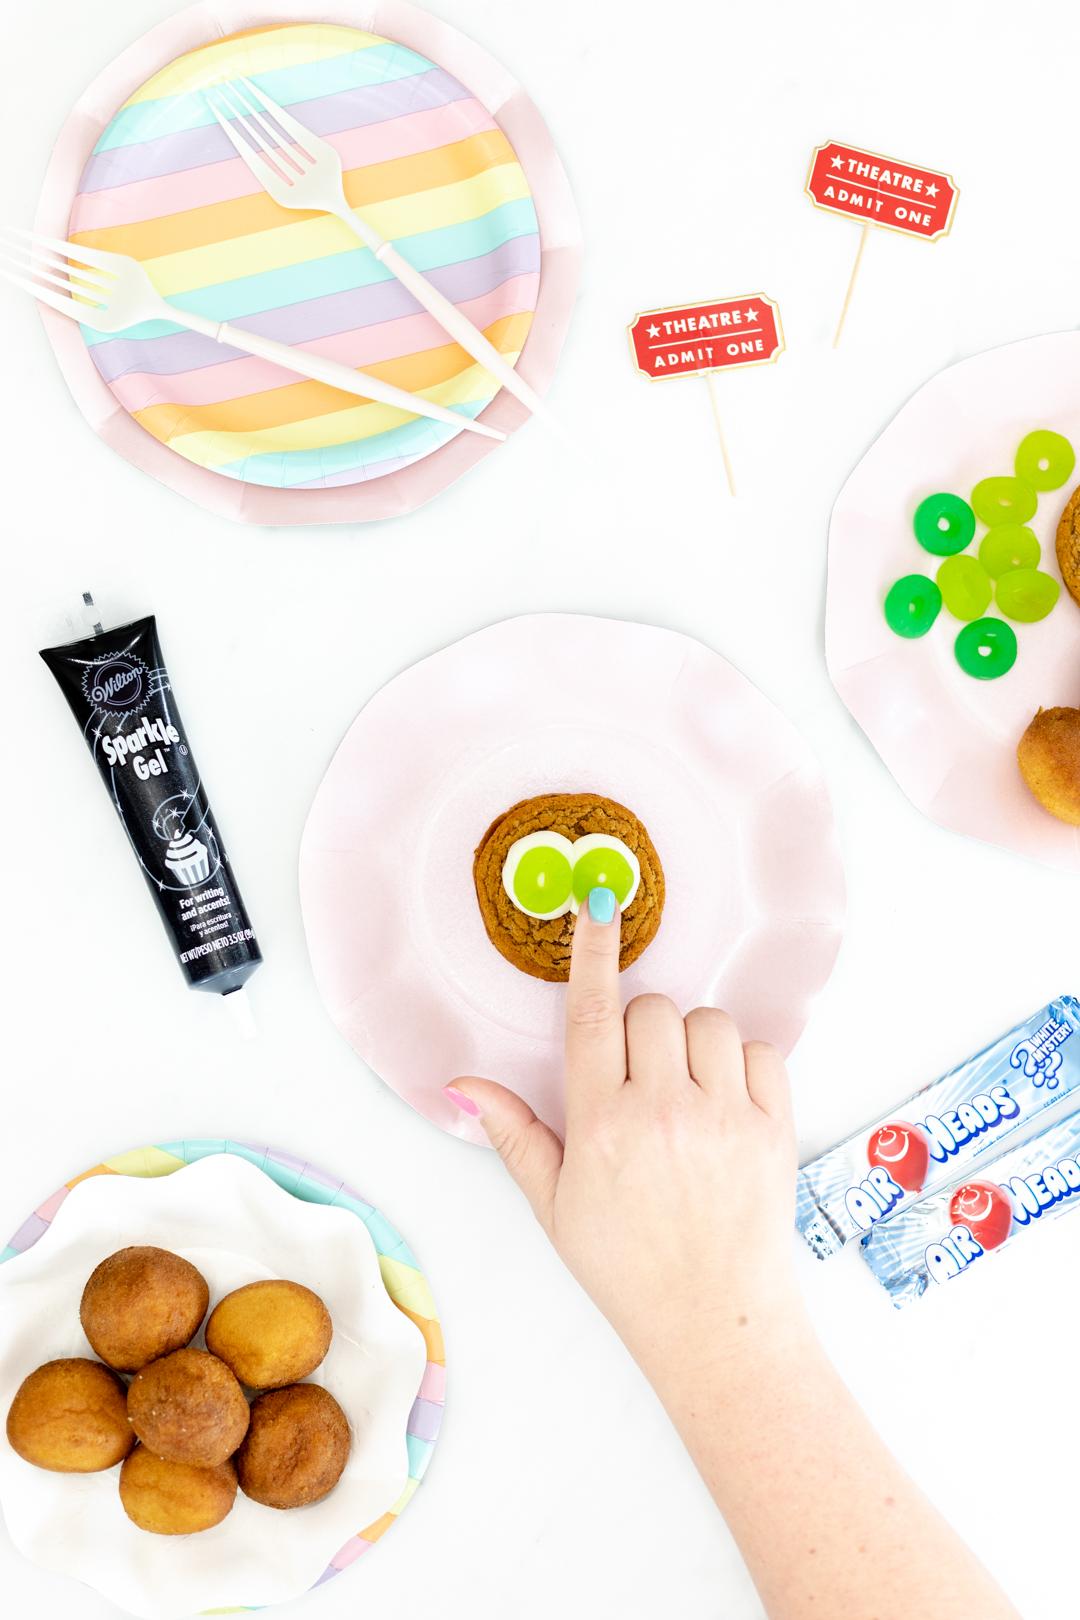 putting lifesaver gummies as eyes for cookies